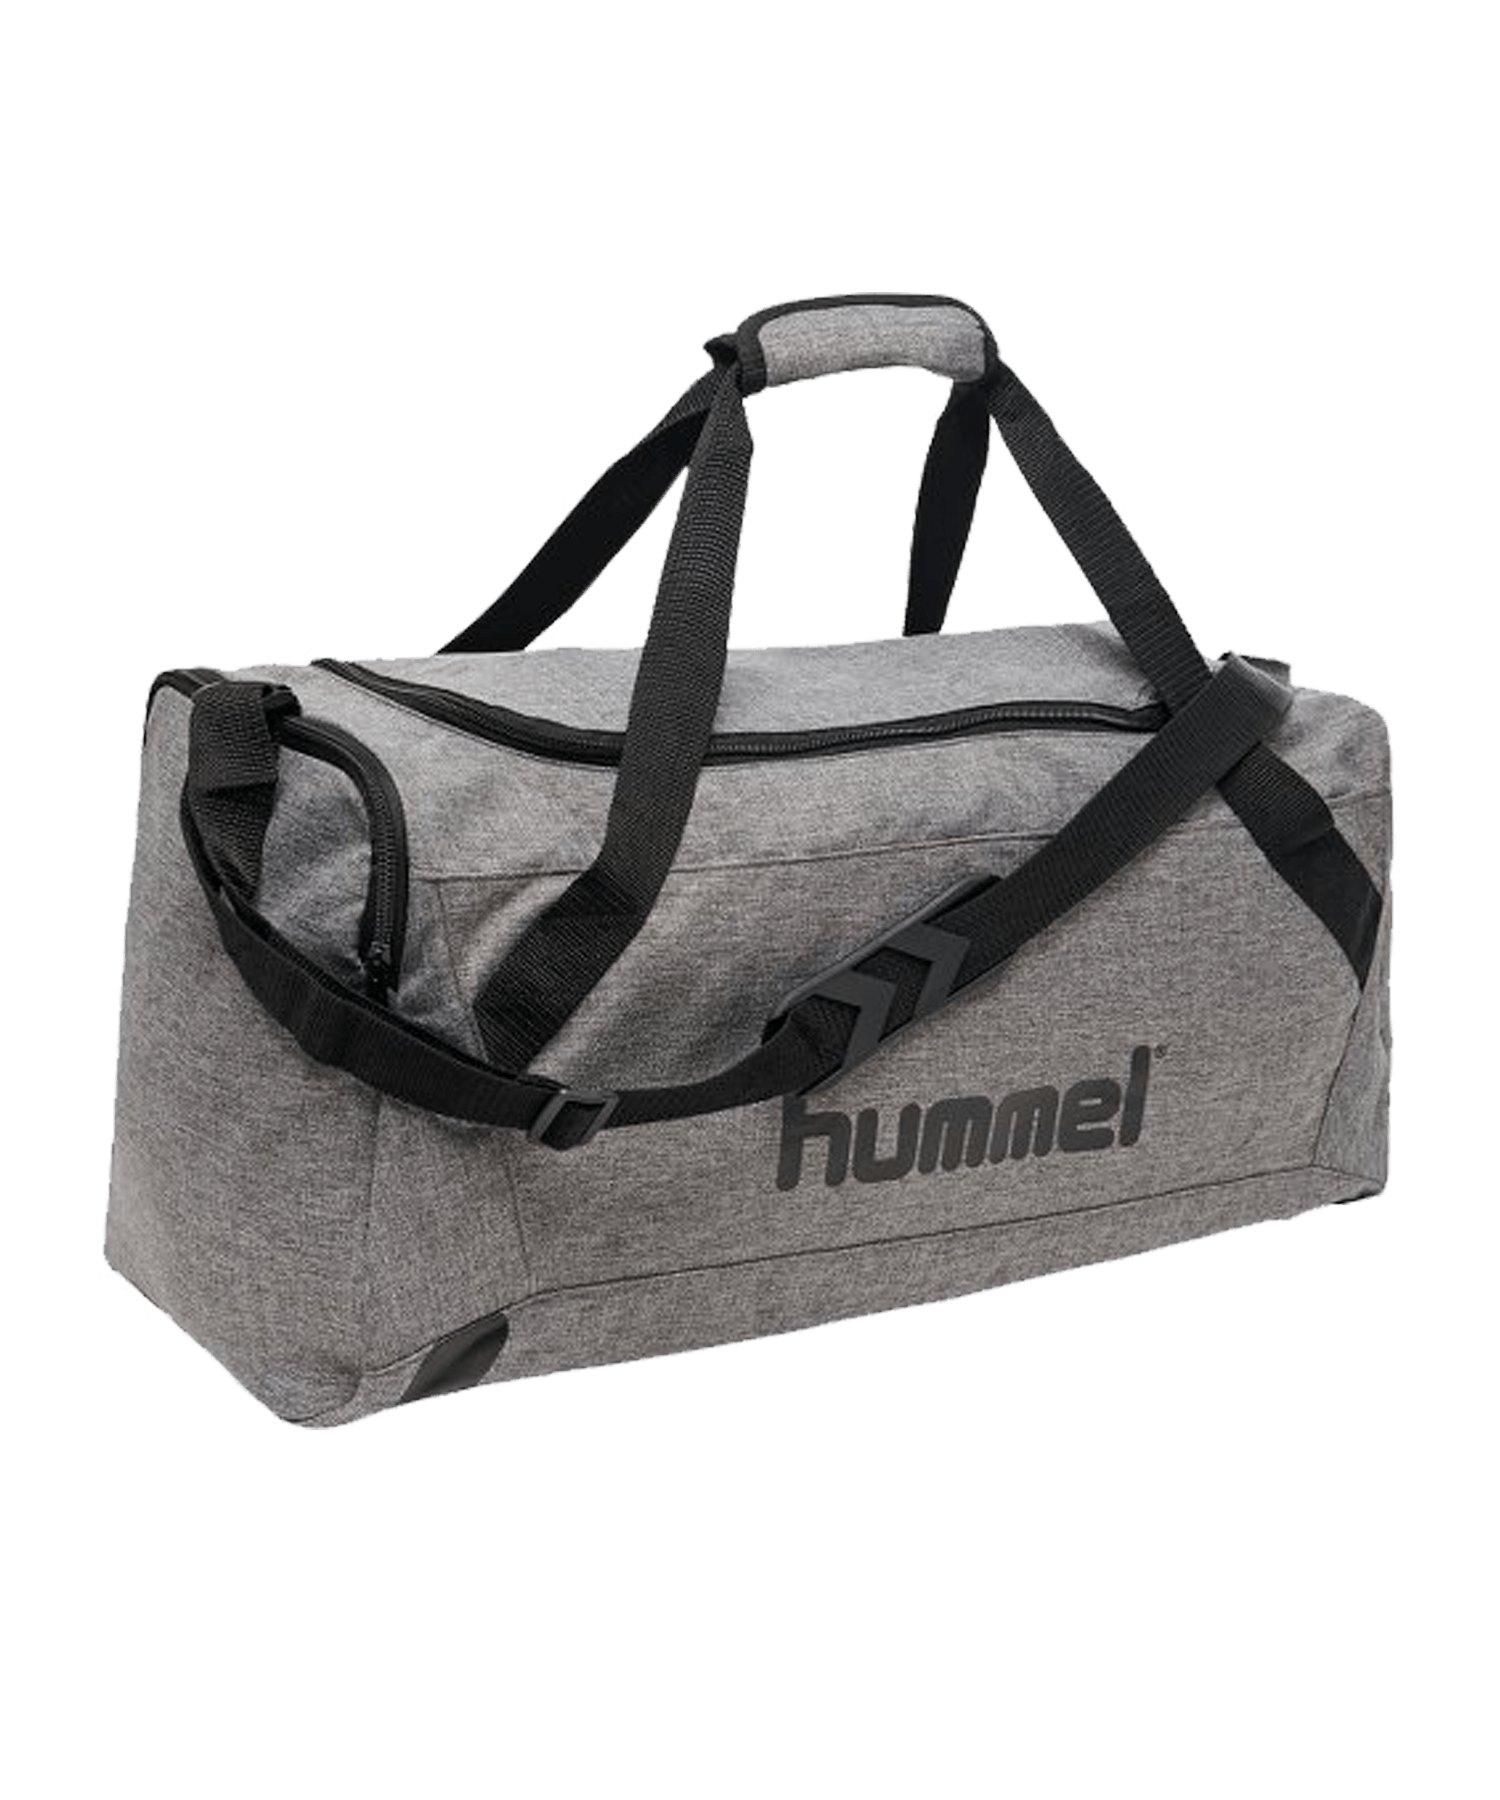 Hummel Core Bag Sporttasche Grau F2006 Gr.M - grau